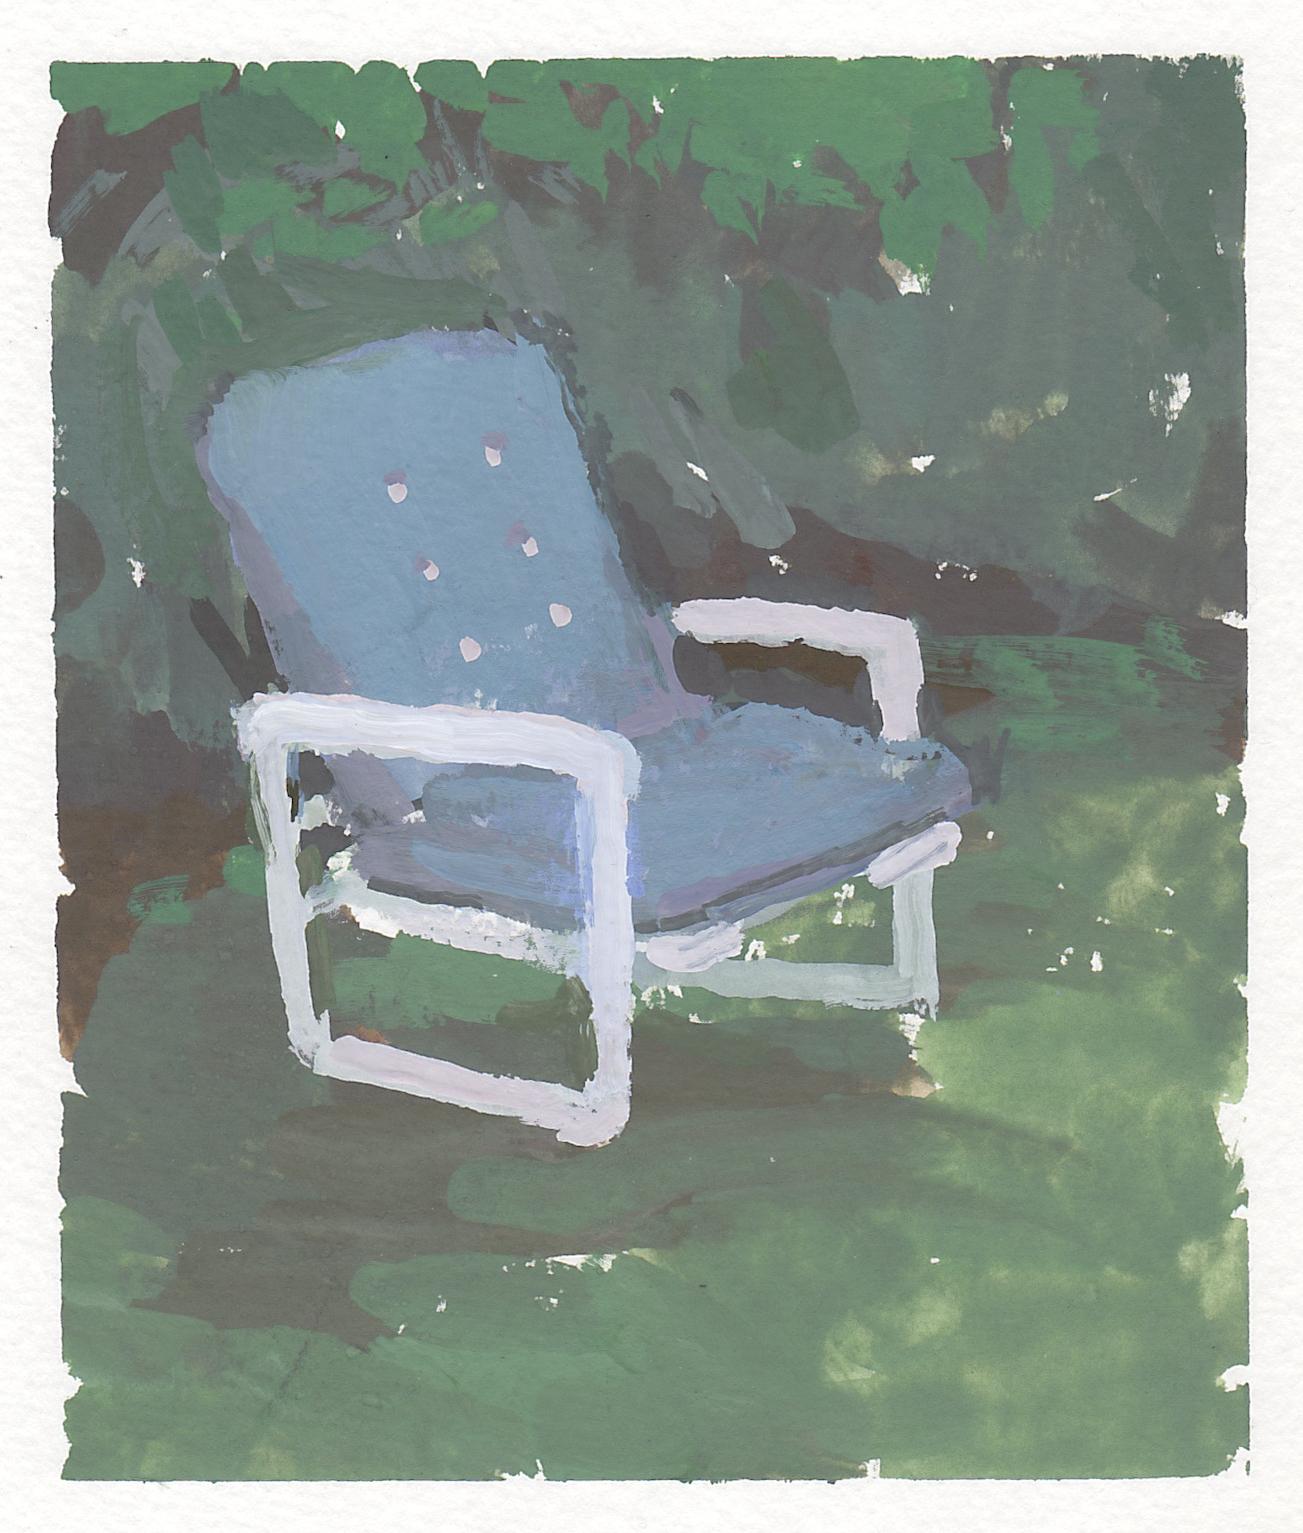 "crocky's blue chair   gouache on paper  4x4.75""  2017"